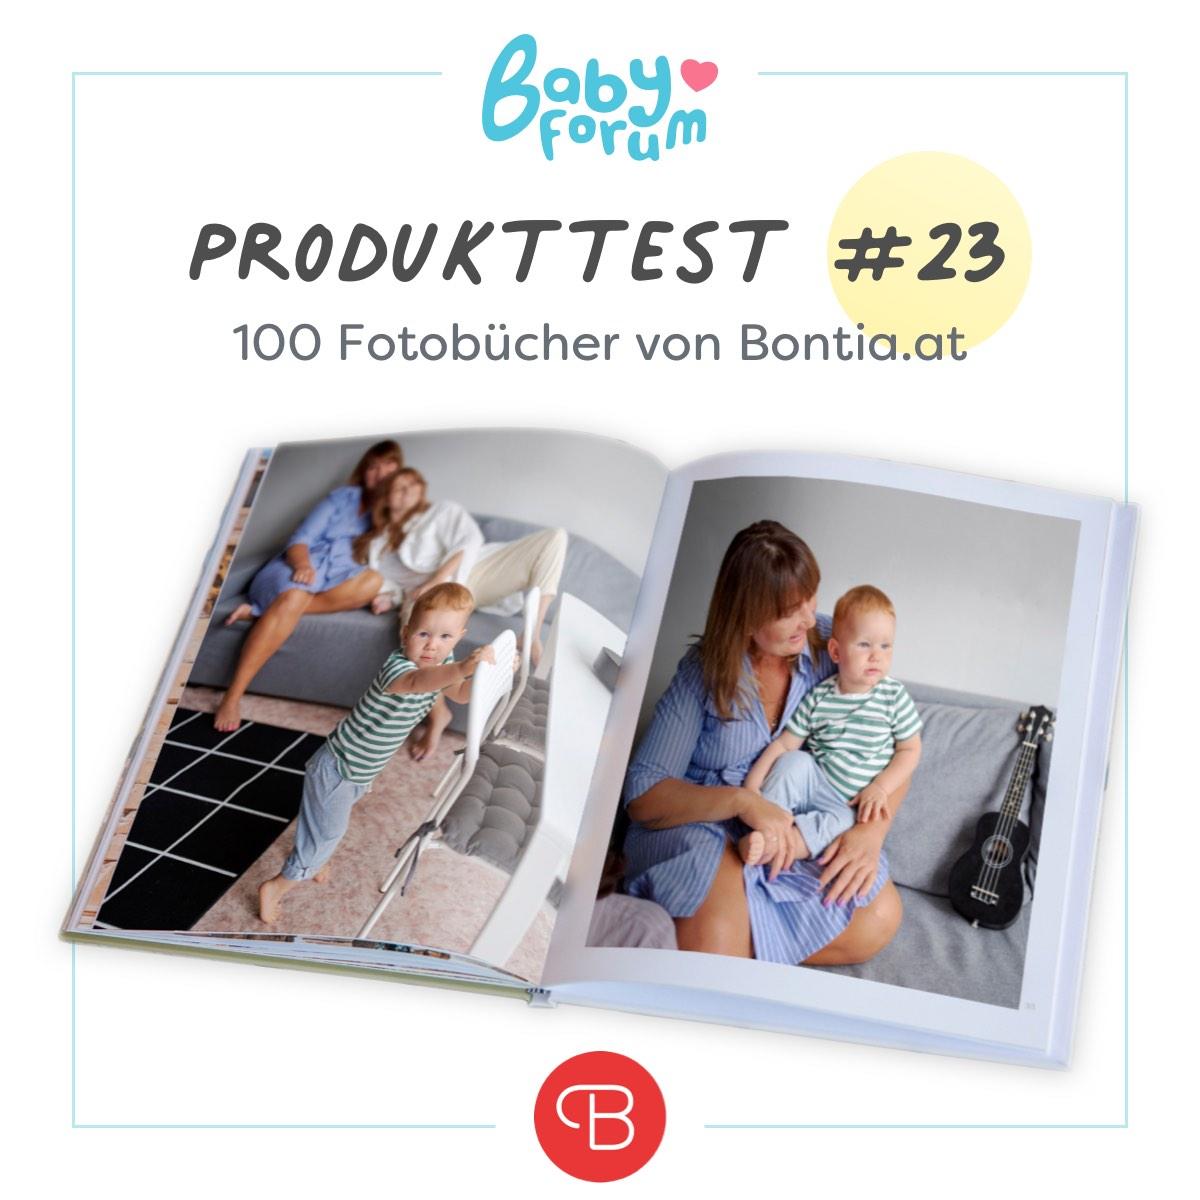 23-Produkttest-Bontia-Fotobuch-BBF-1200.jpg